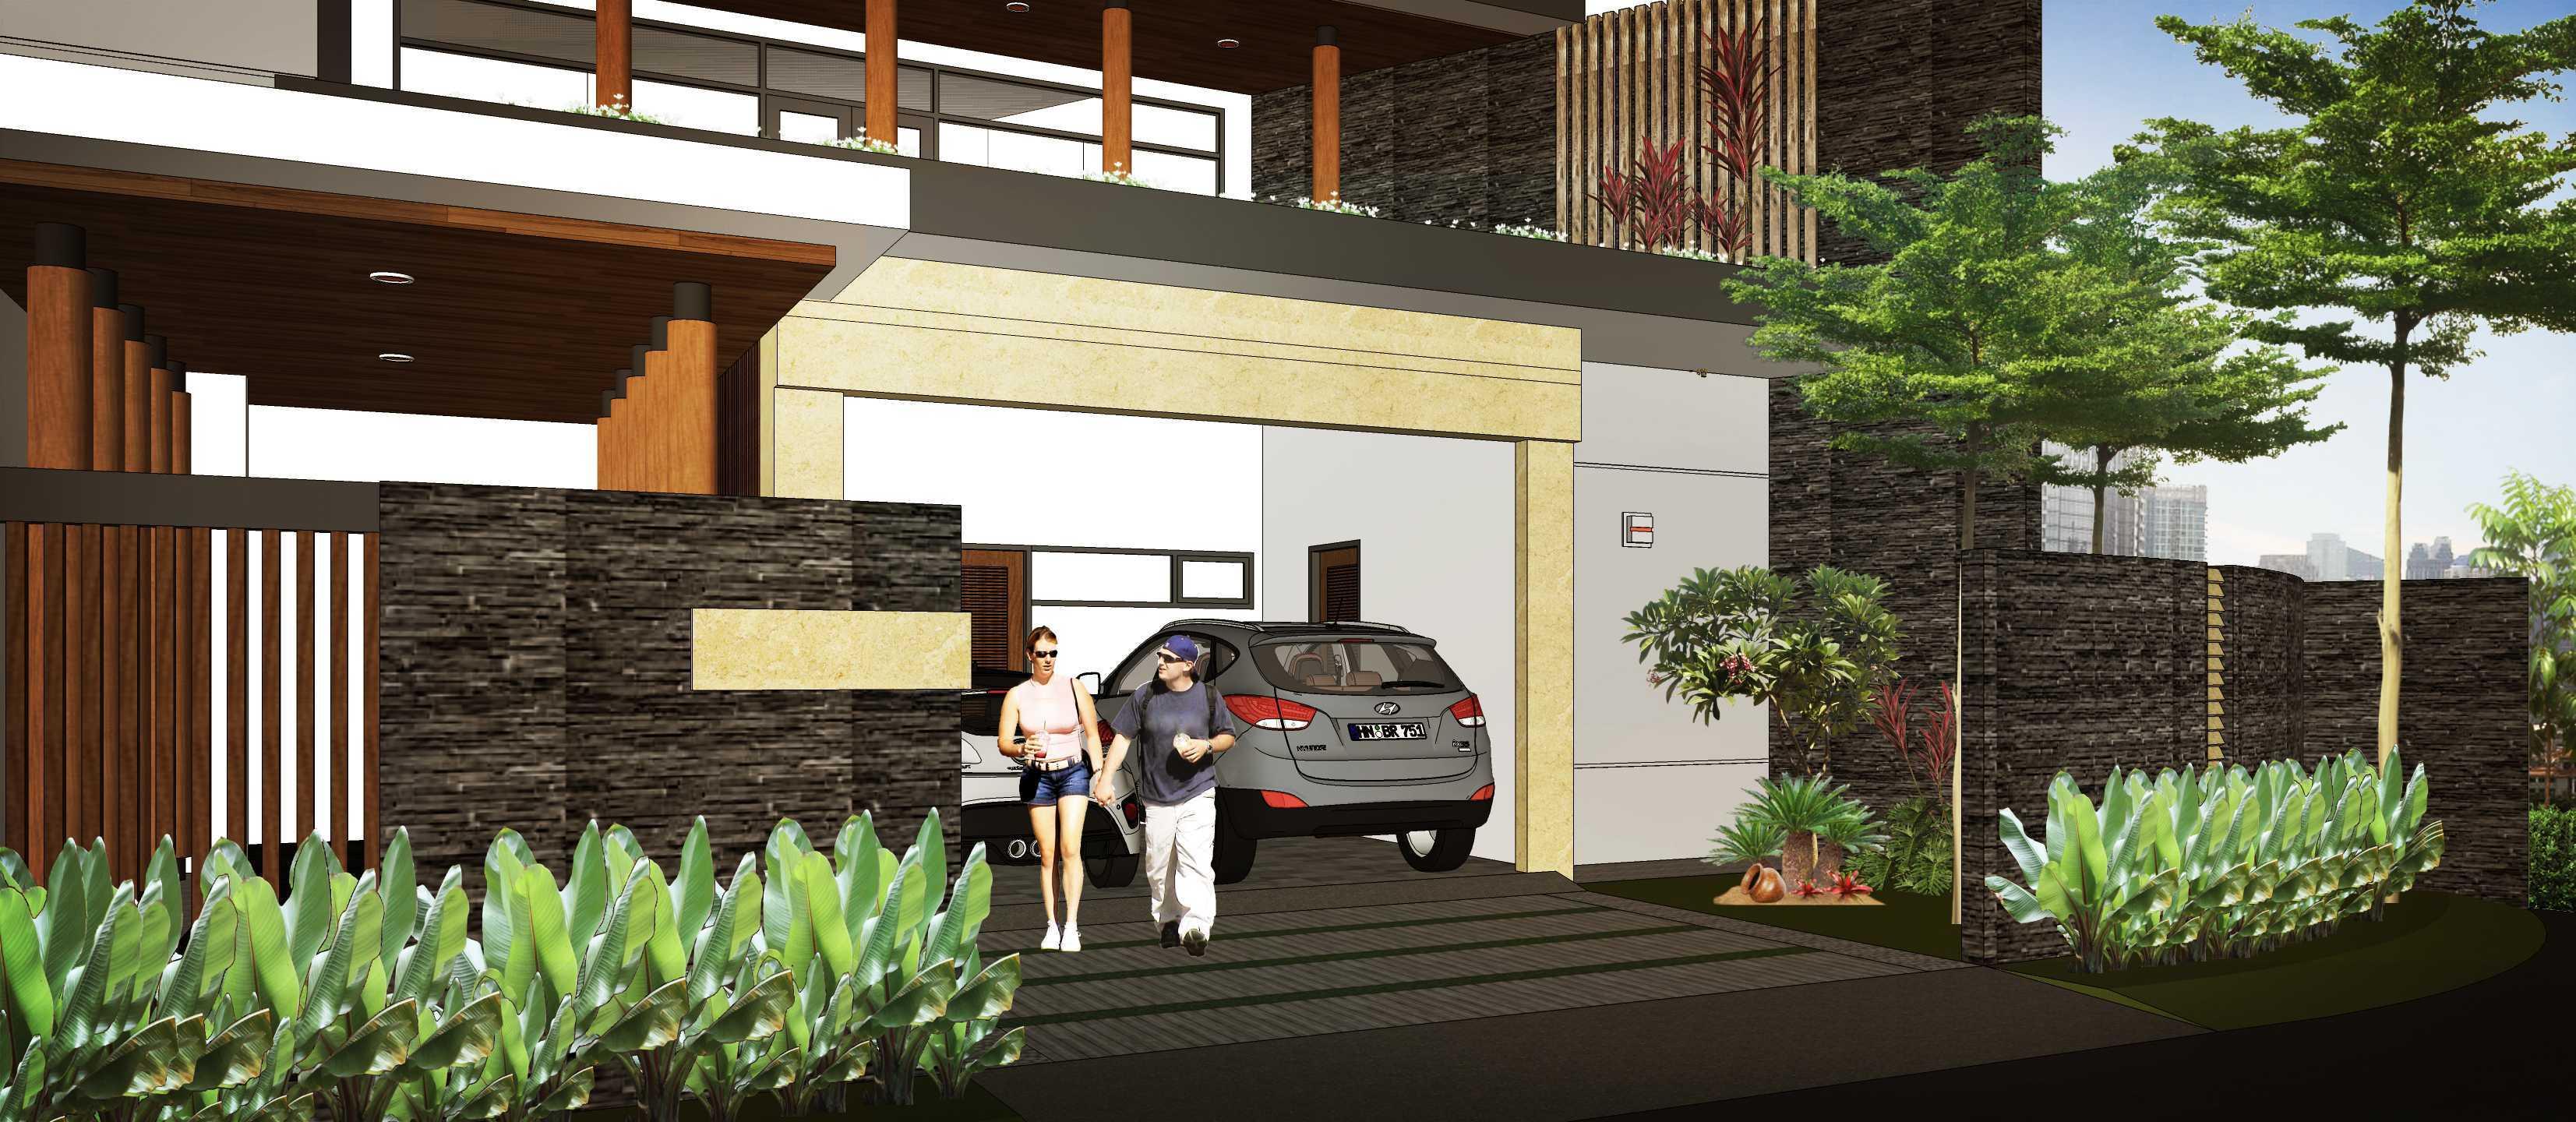 Hendra Budi Architect Privat House Tangerang Tangerang Tangerang Front View Modern  16902